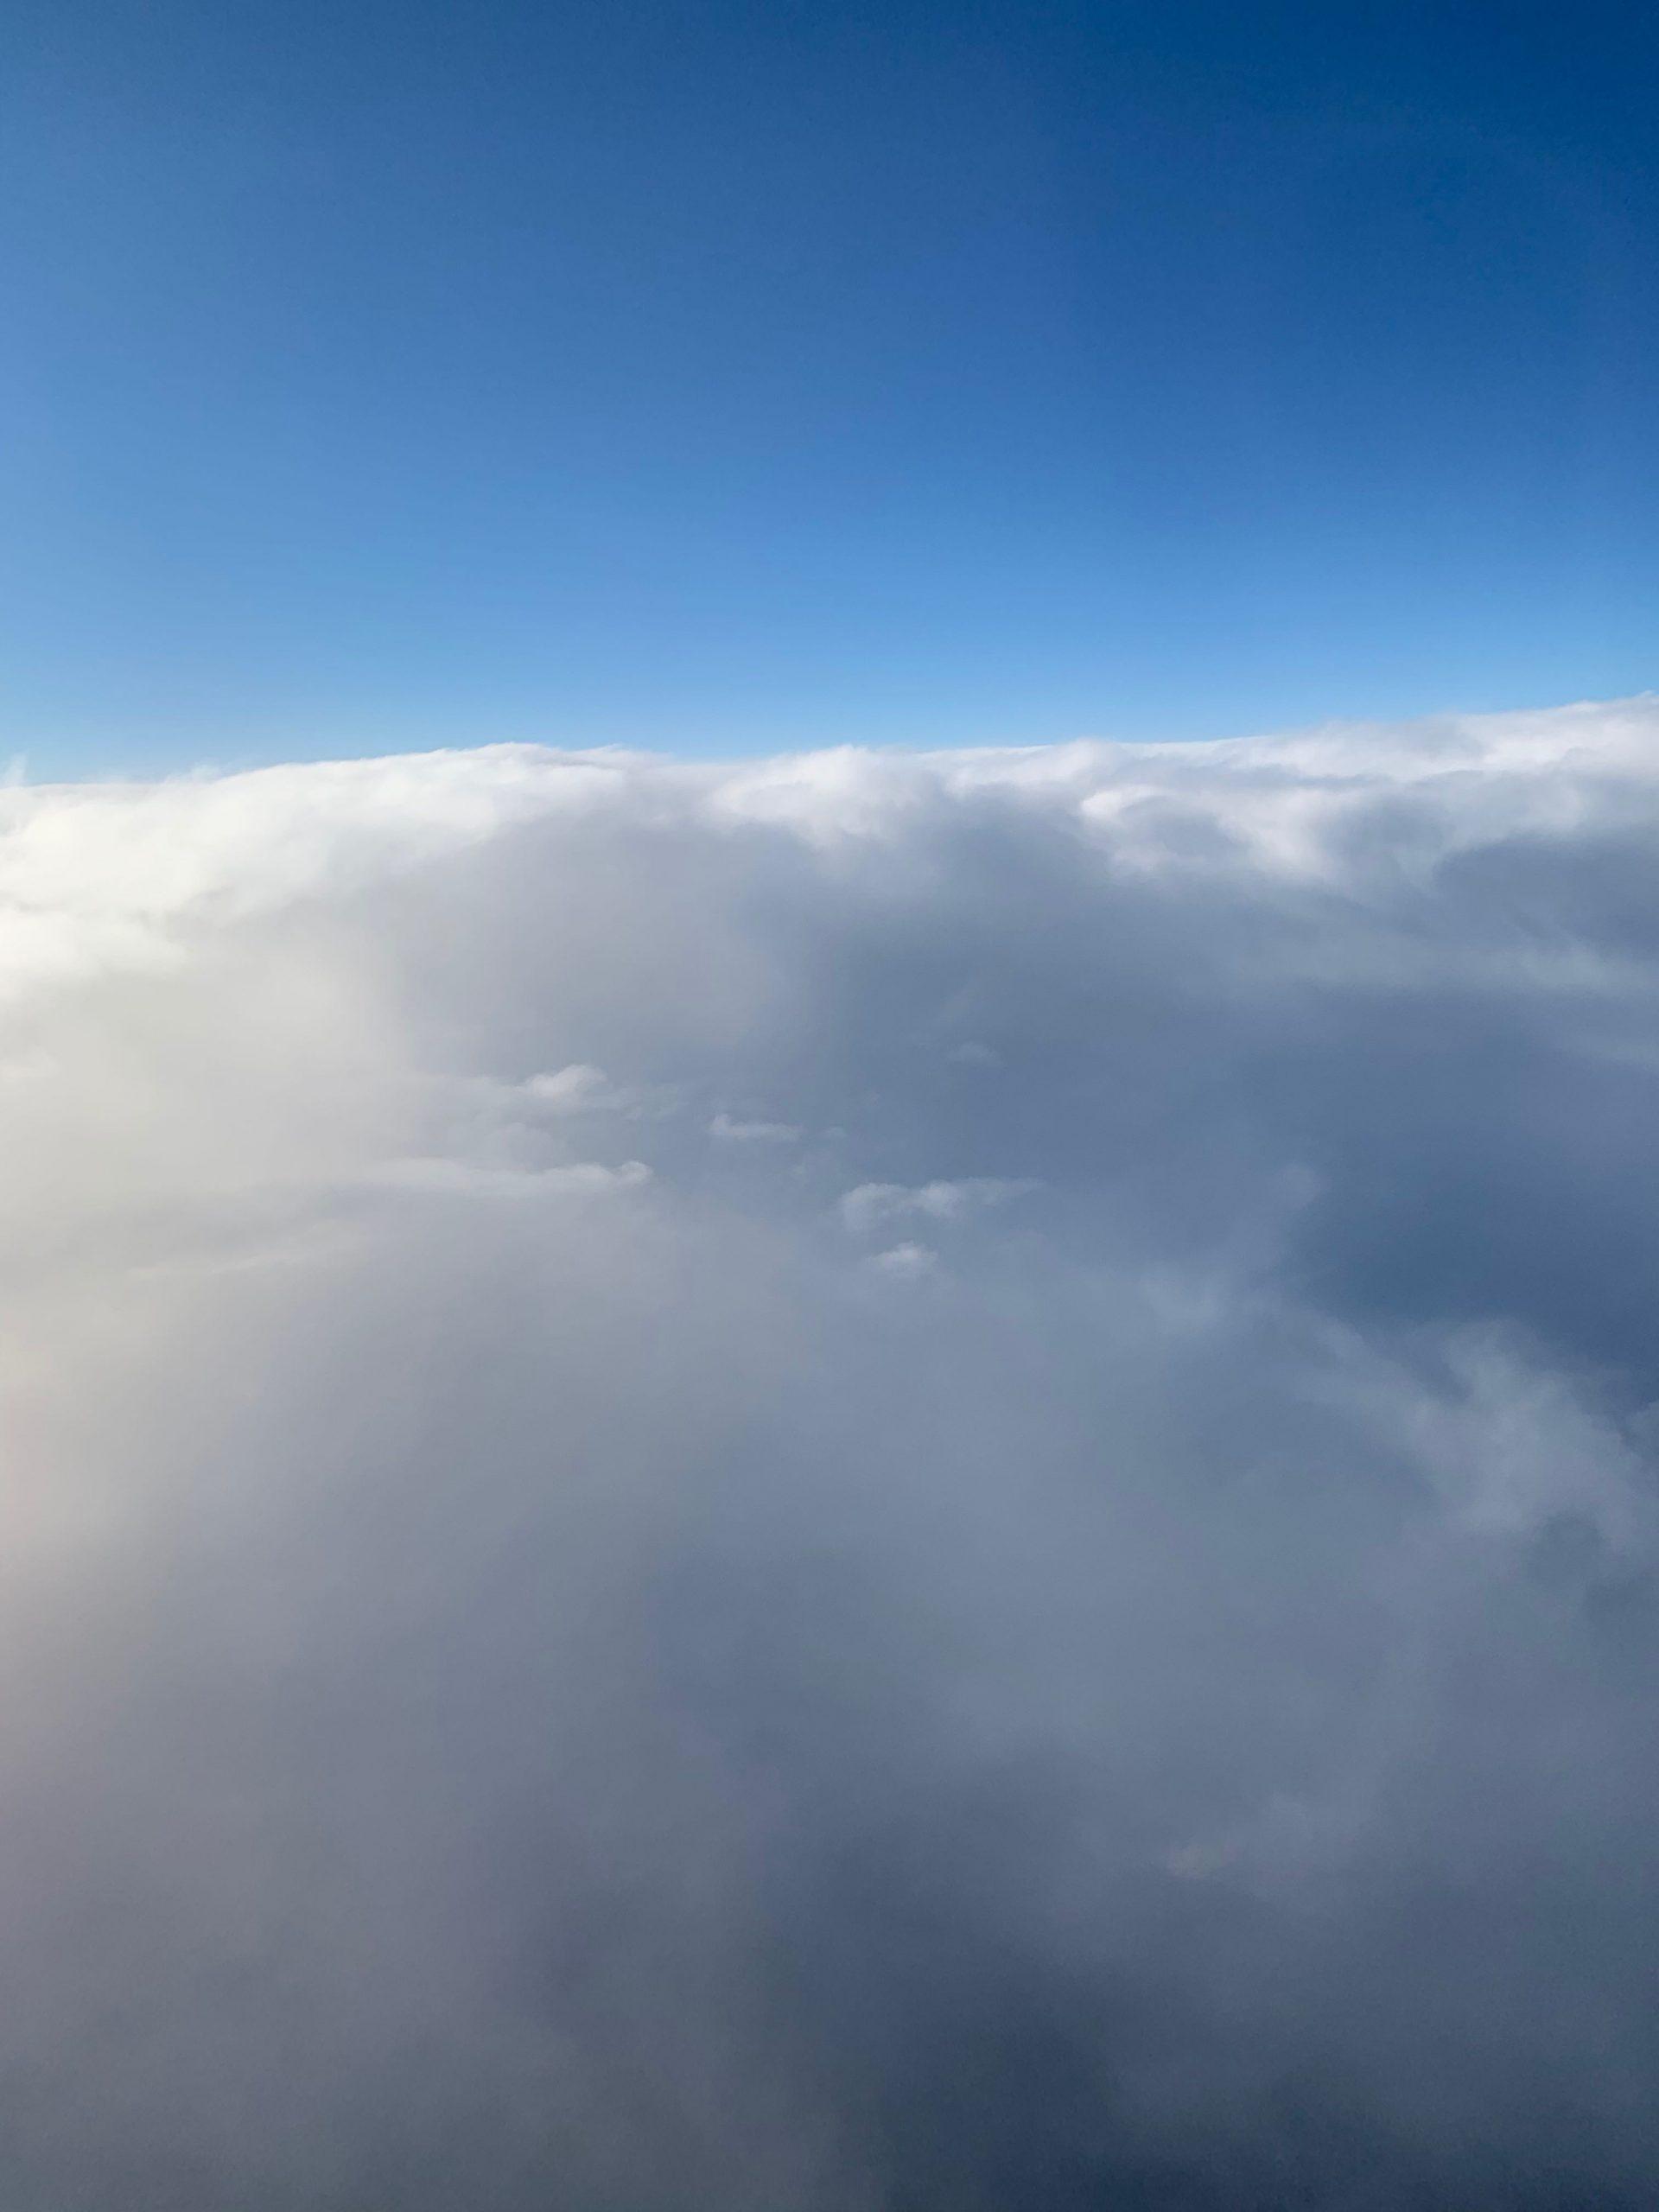 Heaven's view